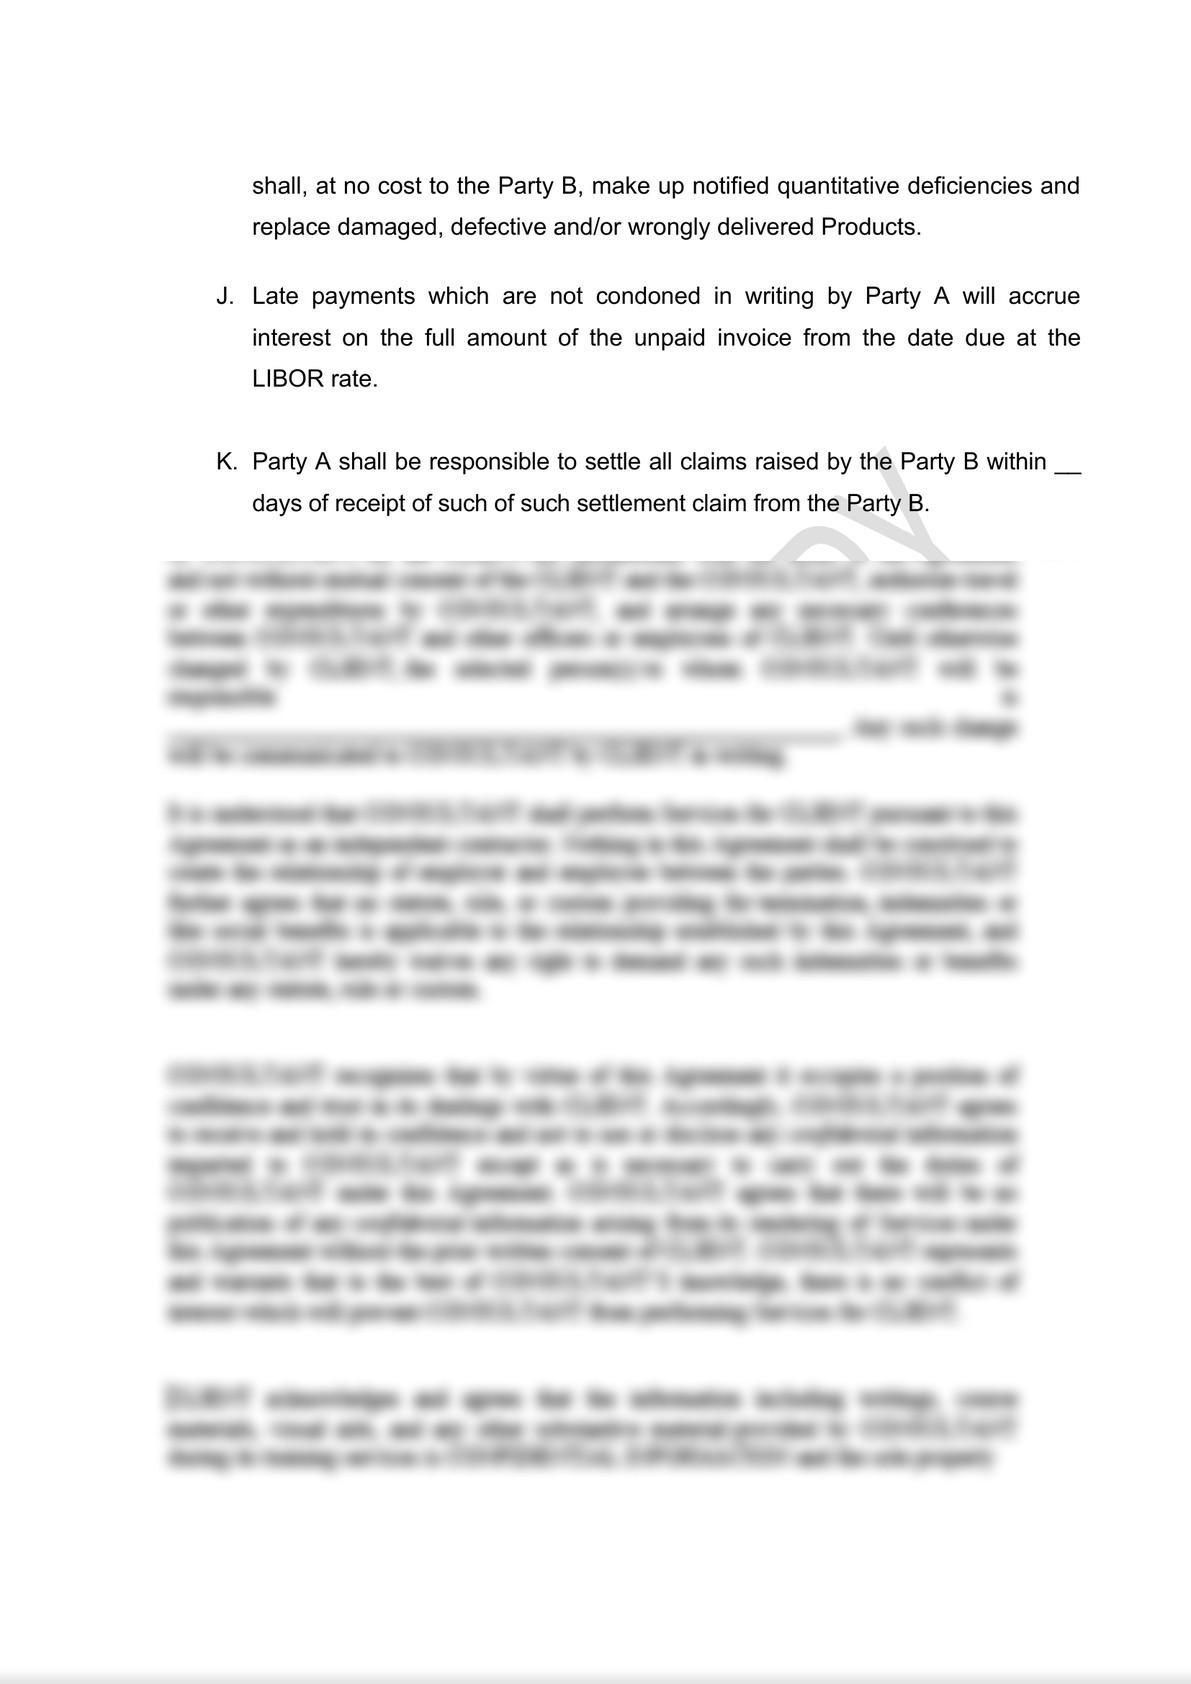 Distribution Agreement Draft (iii)-5